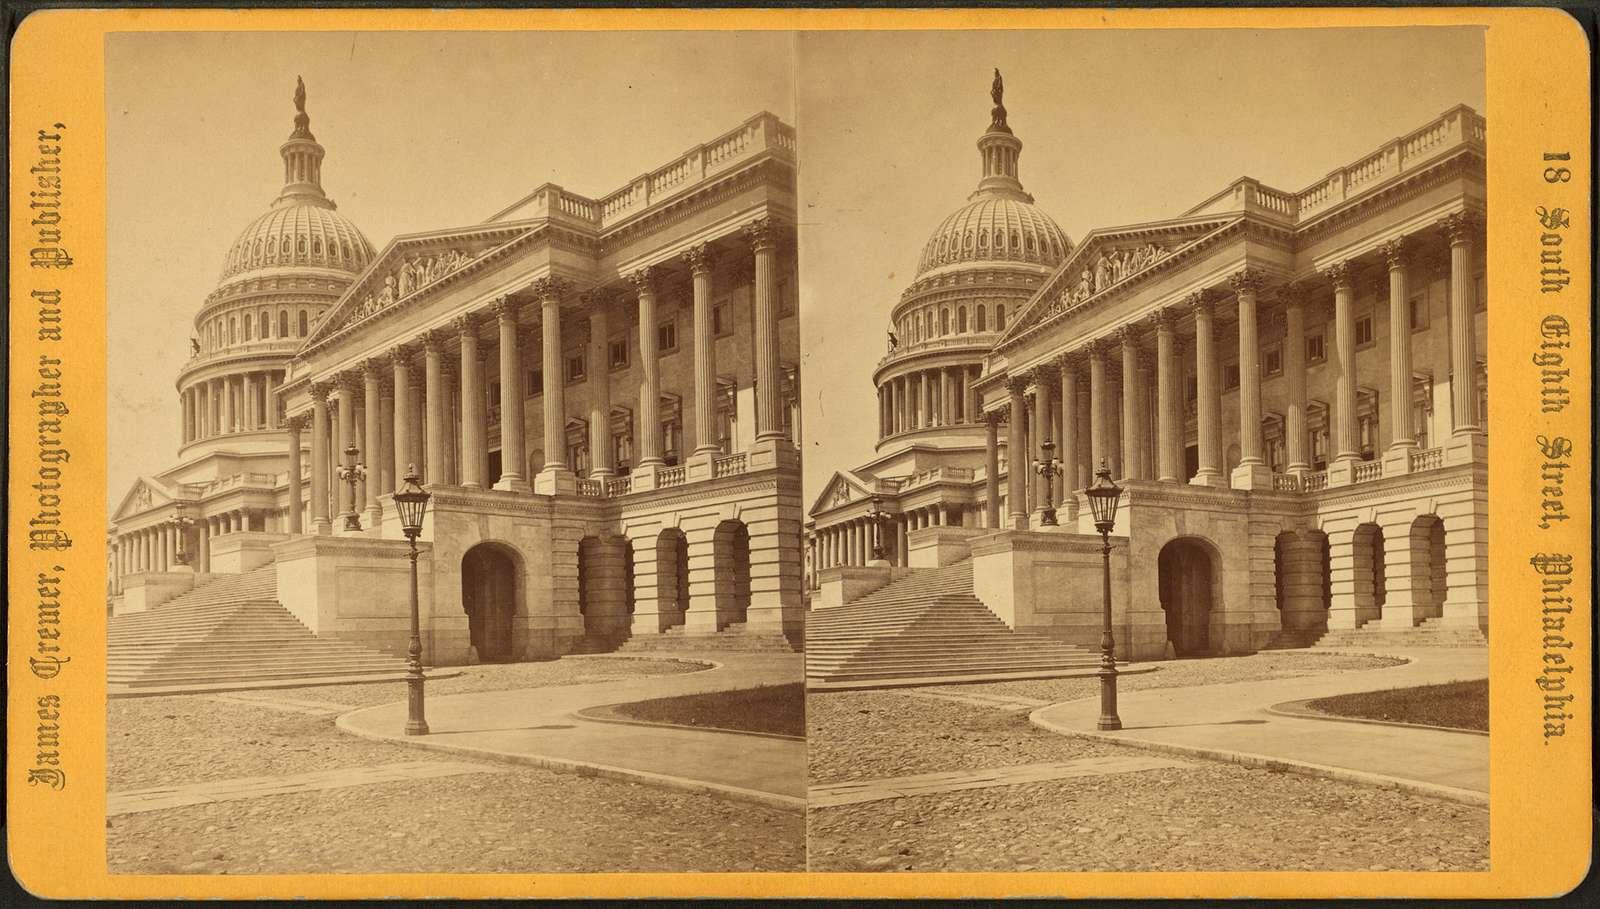 Senate Front & Dome, U.S. Capitol, Washington, D.C.